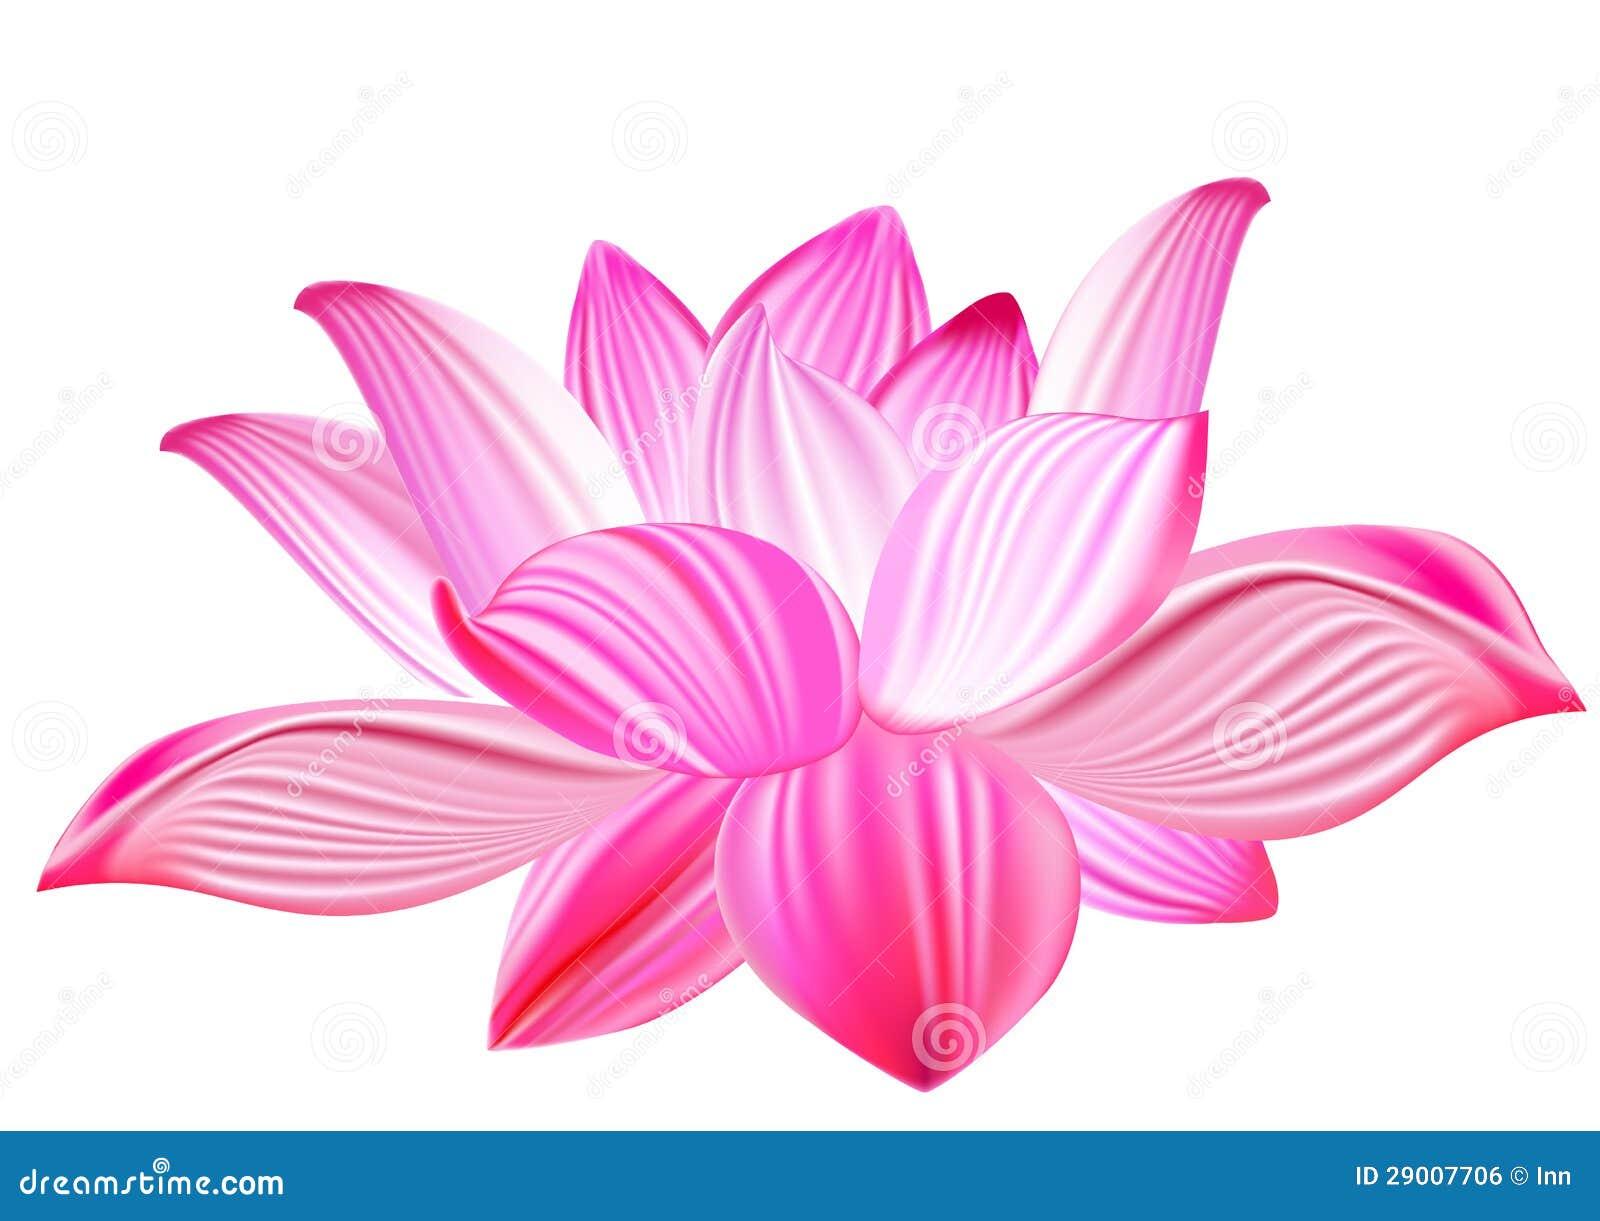 Lotus Flower Bomb Downloadlotus Realistic Vector Illustration